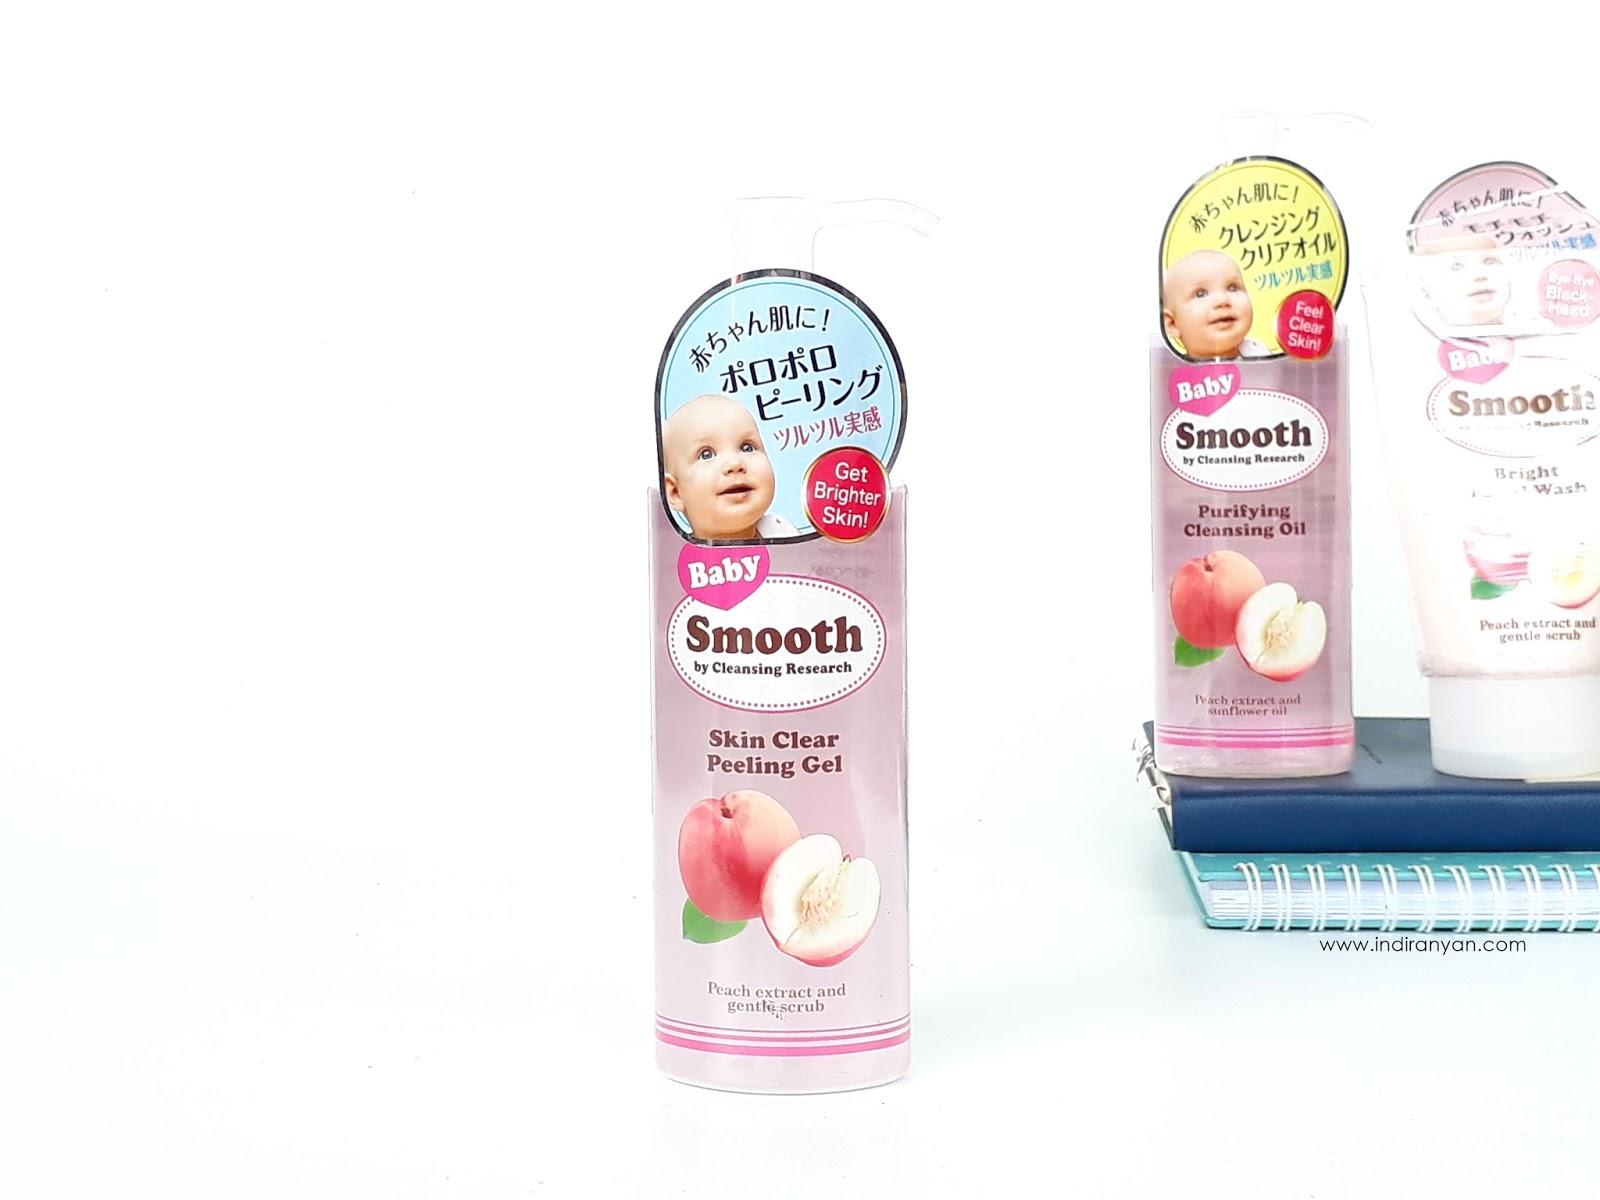 bcl-skin-clear-peeling-gel-with-aha-baby-smooth, bcl-skin-clear-peeling-gel-with-aha-baby-smooth-review, bcl-baby-smooth-skin-clear-peeling-gel